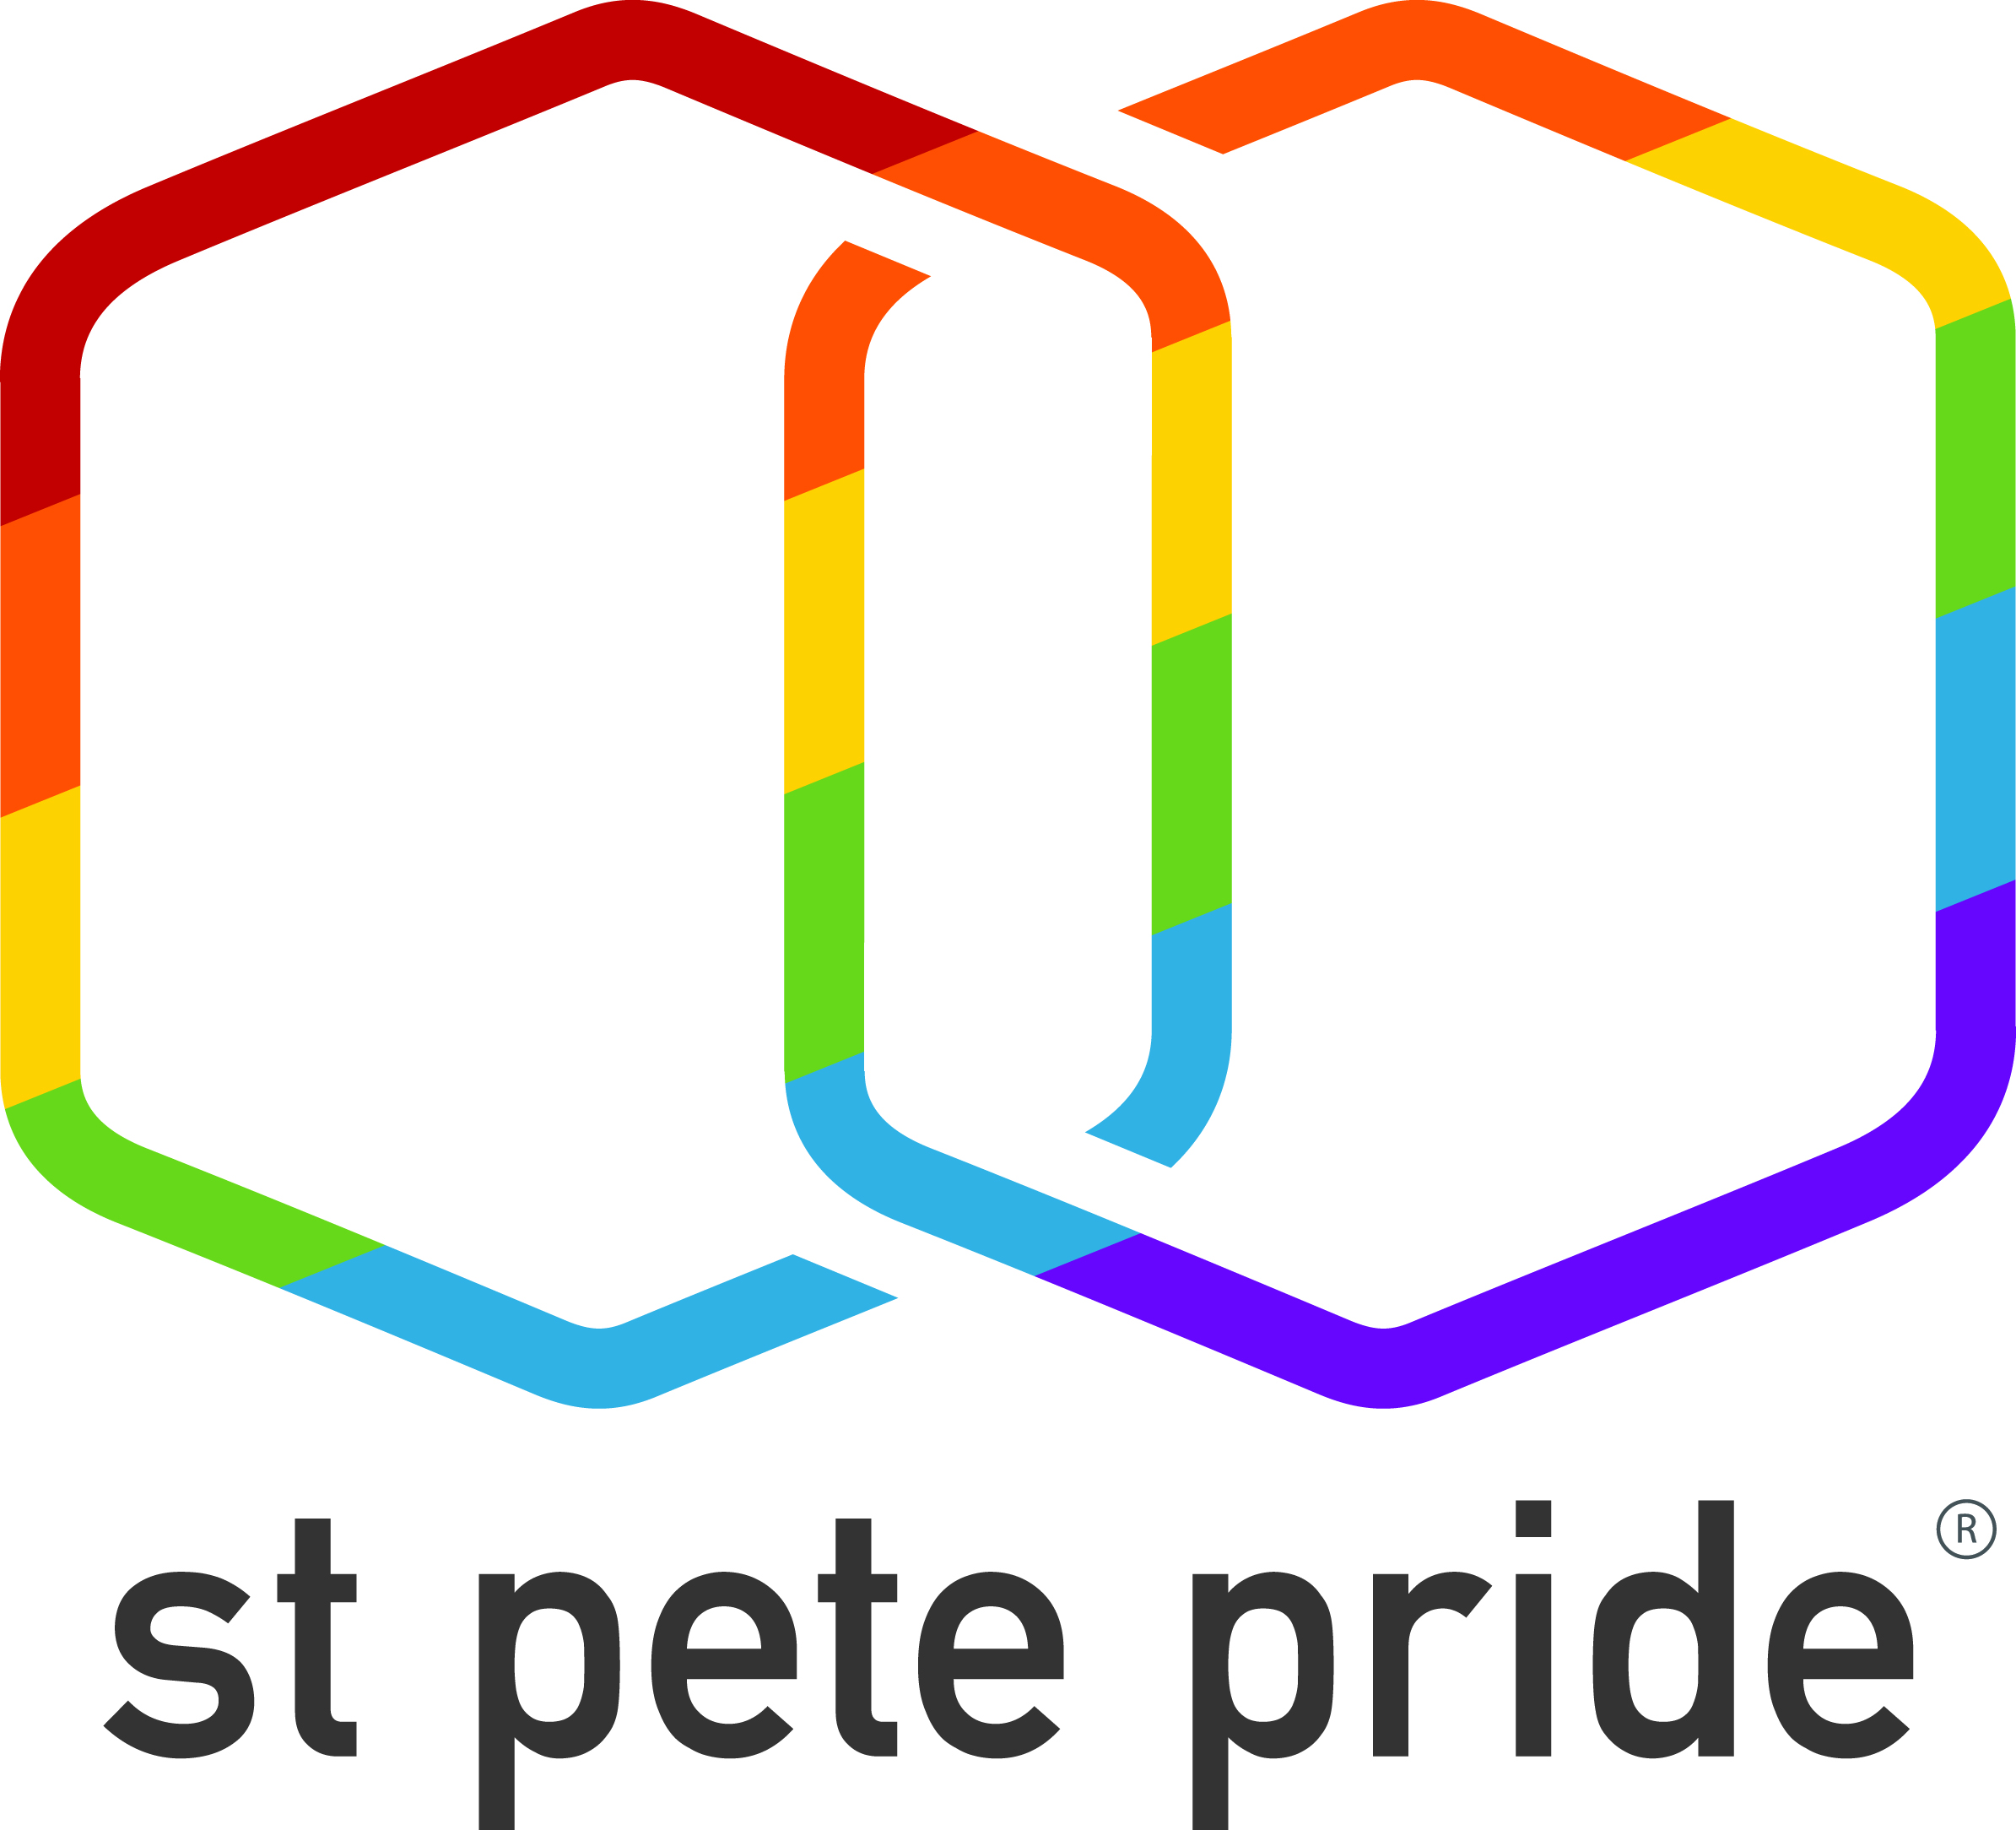 PrideStackedLogoRainbowReserved